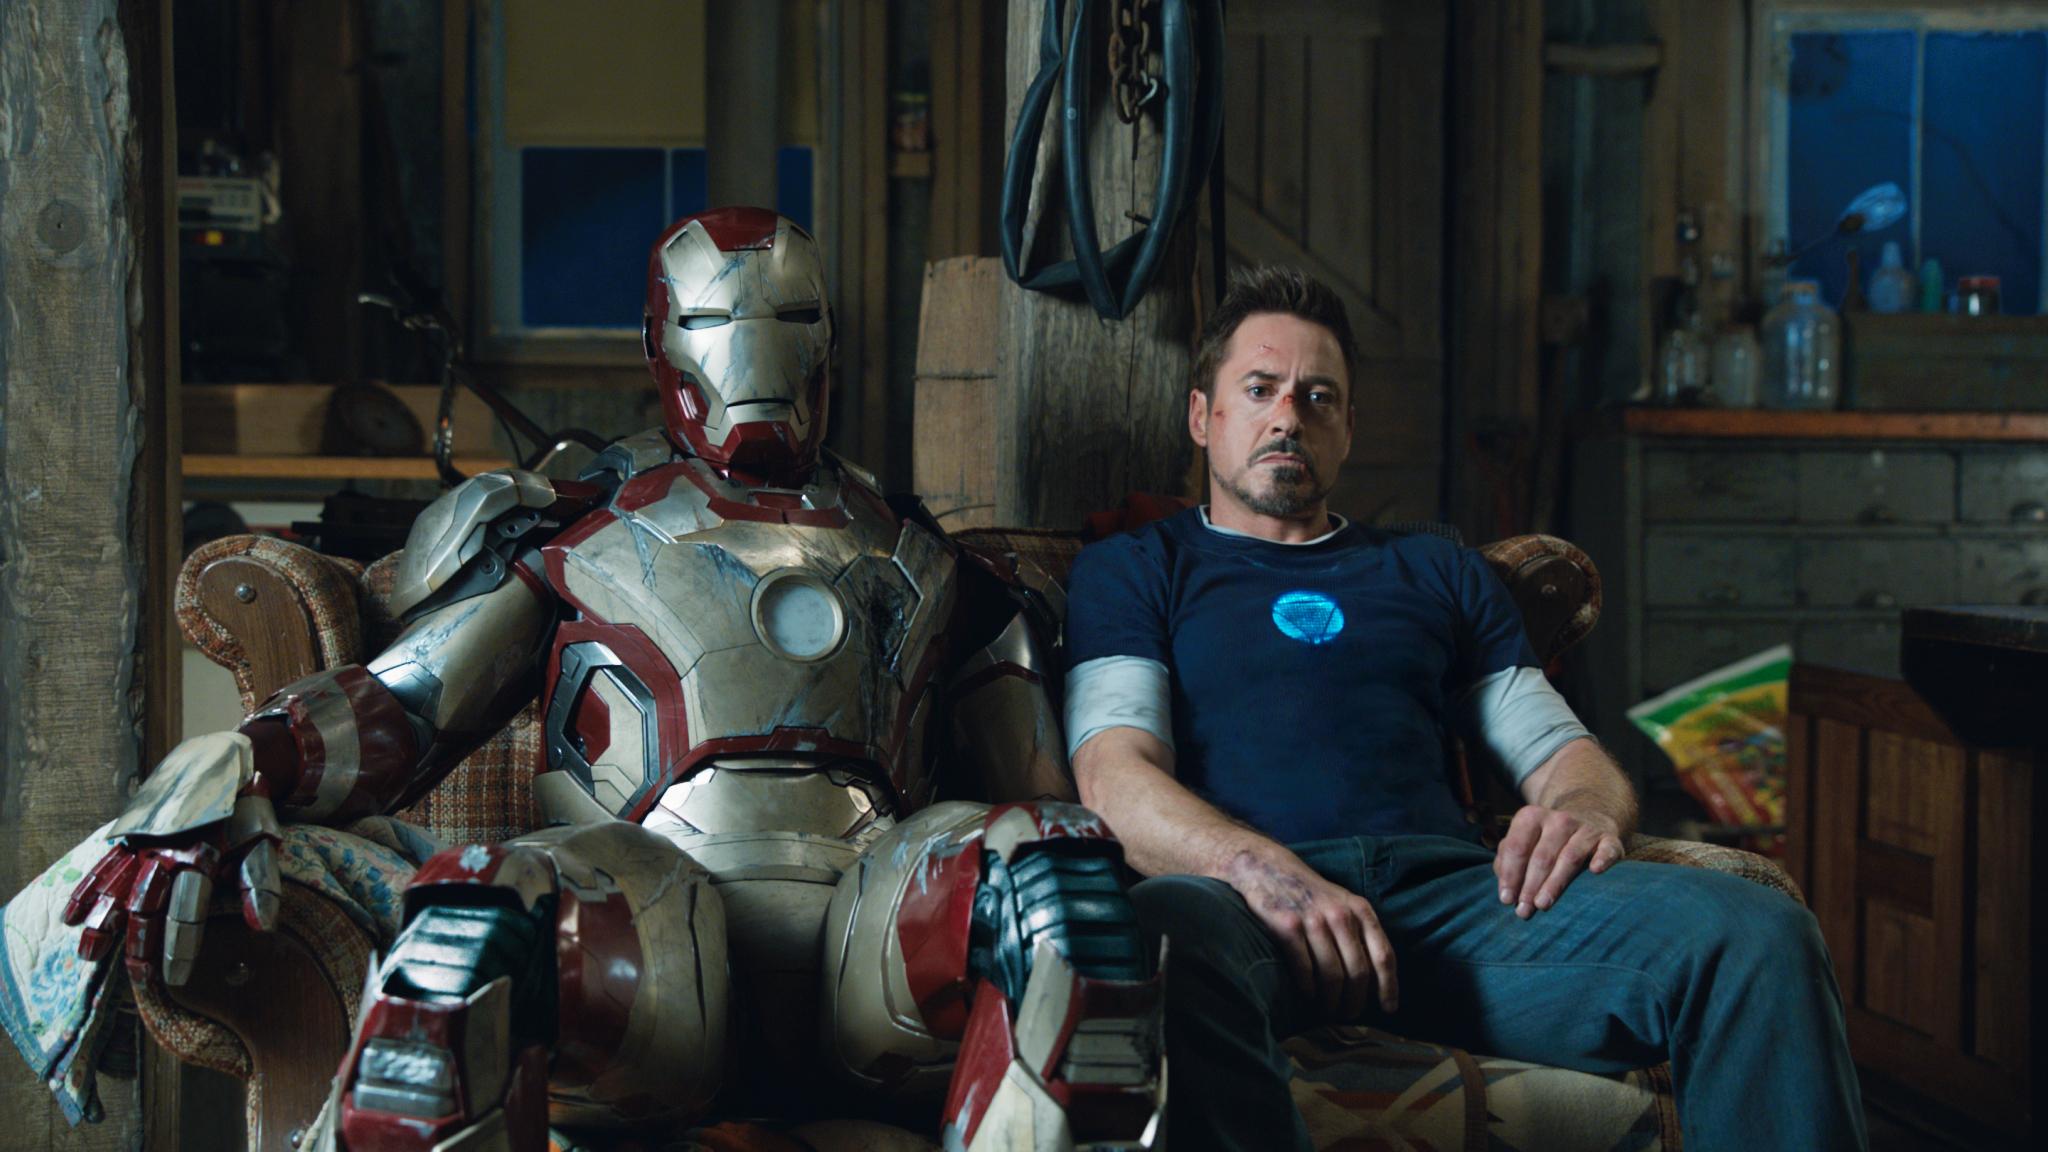 HQ Iron Man 3 Wallpapers | File 2695.07Kb